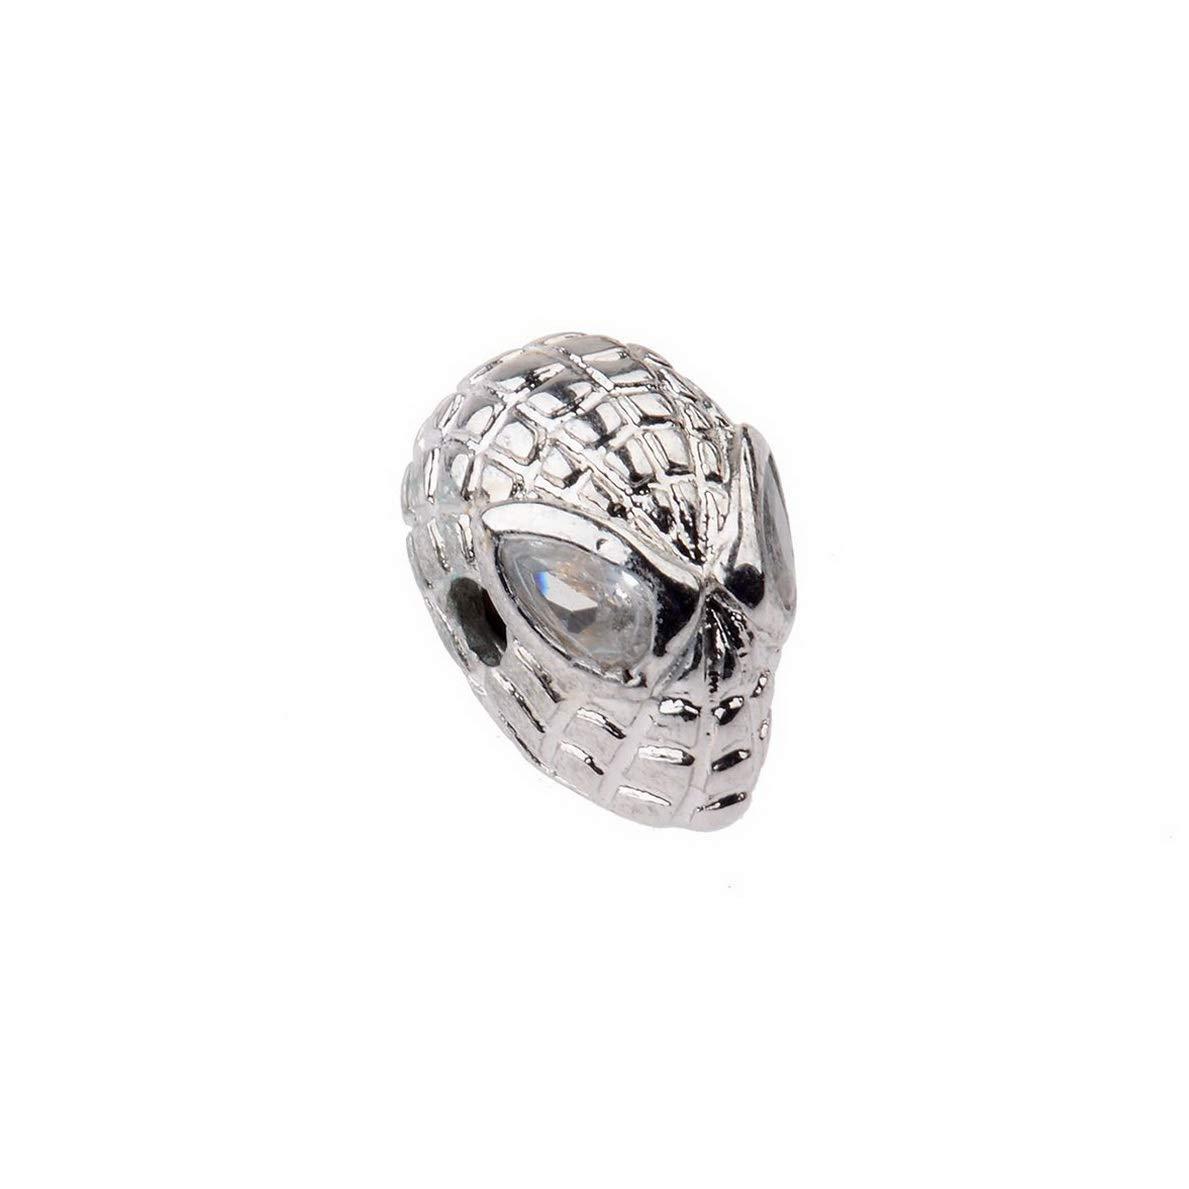 Gatton Zircon Gemstones Spiderman Bracelet Connector Charm Beads Silver Gold Rose 42779 Model BRCLT